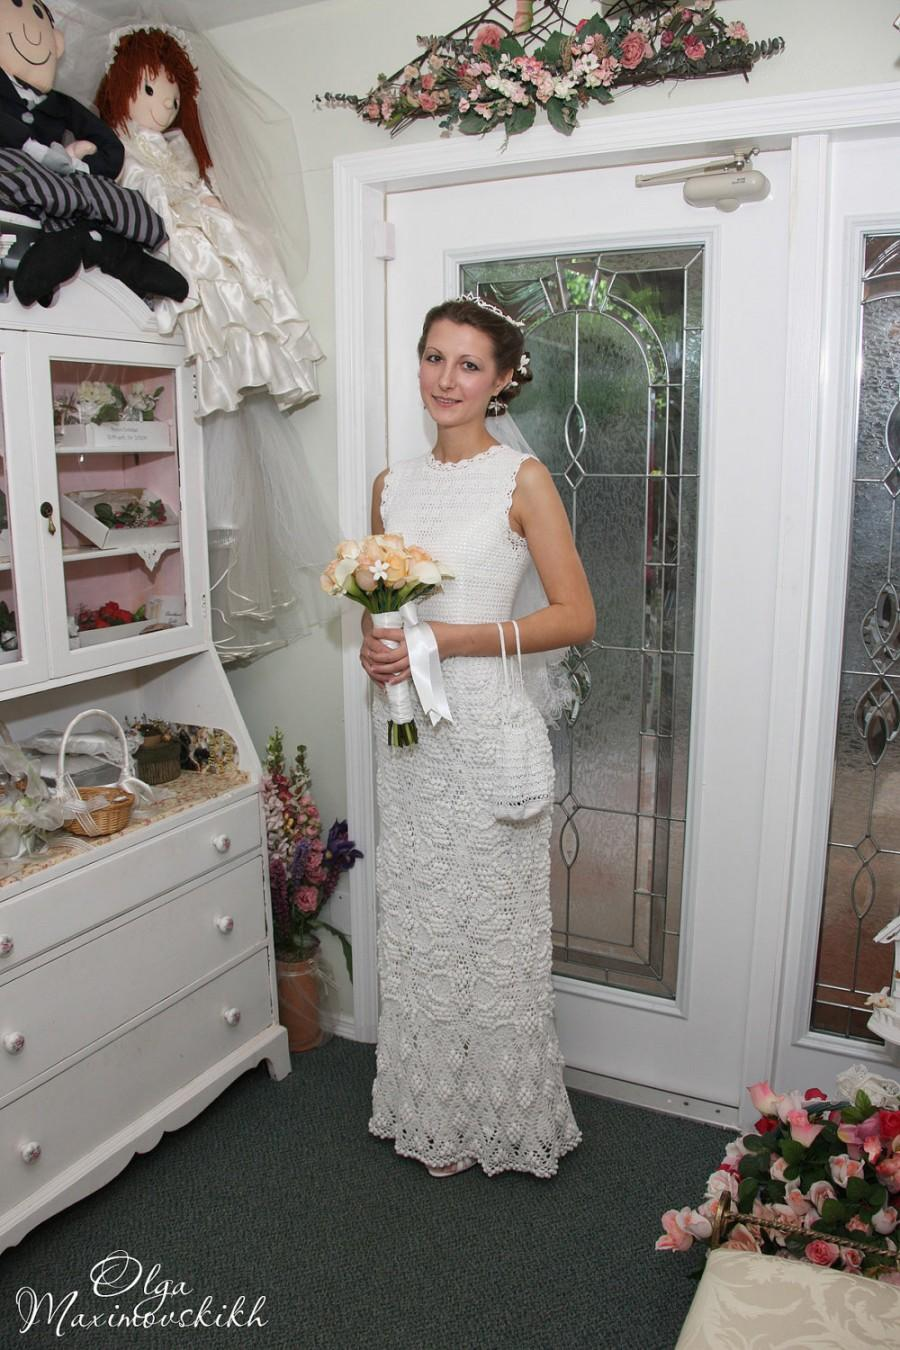 Crochet Wedding Dress. Made To Order. Custom Made #2440000 - Weddbook